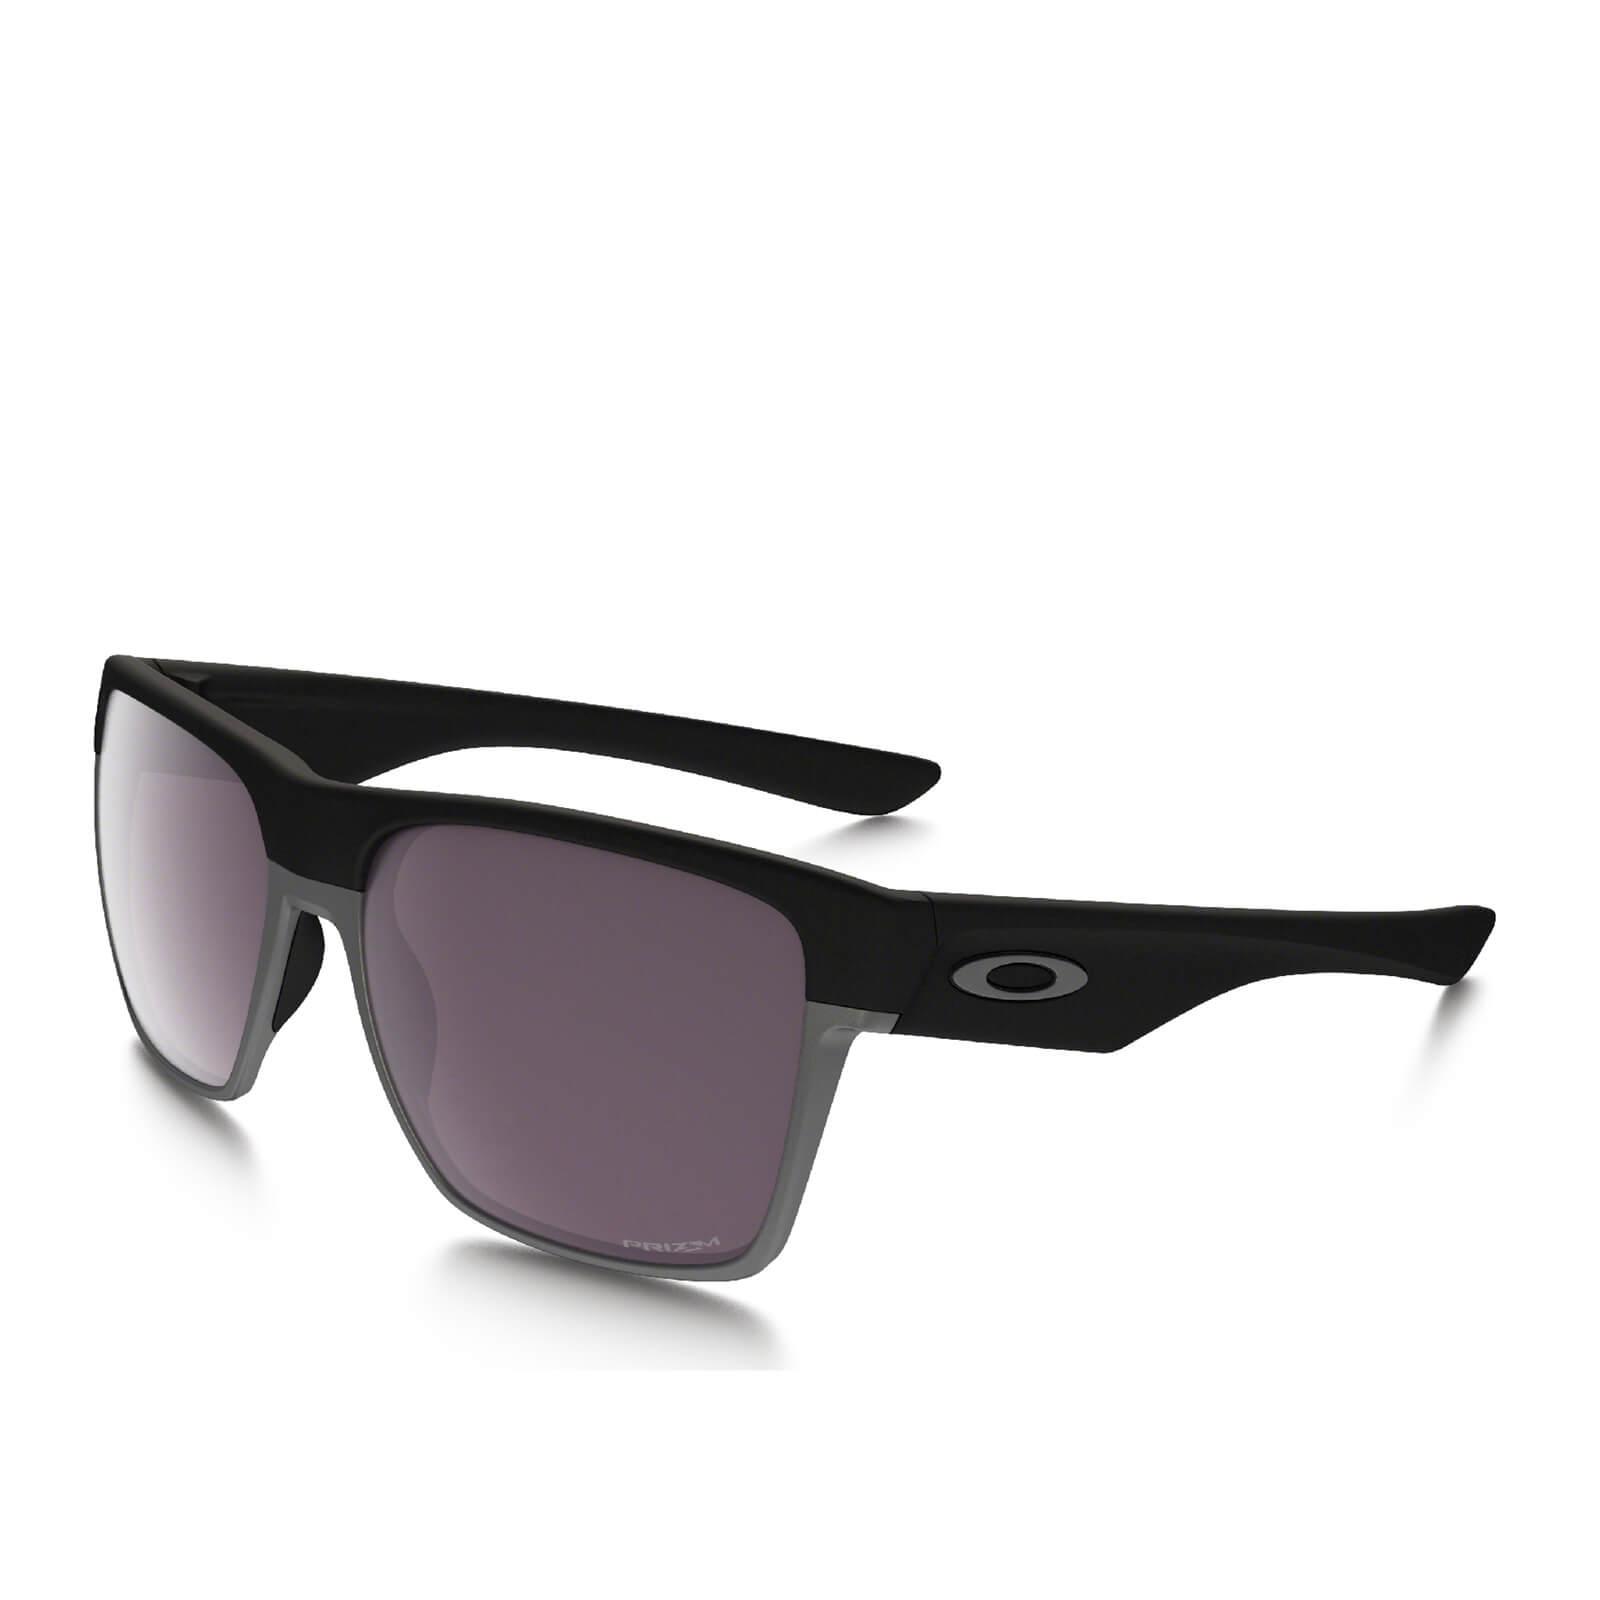 2770e6fe56 Oakley TwoFace XL Prizm Sunglasses - Matte Black Prizm Daily ...